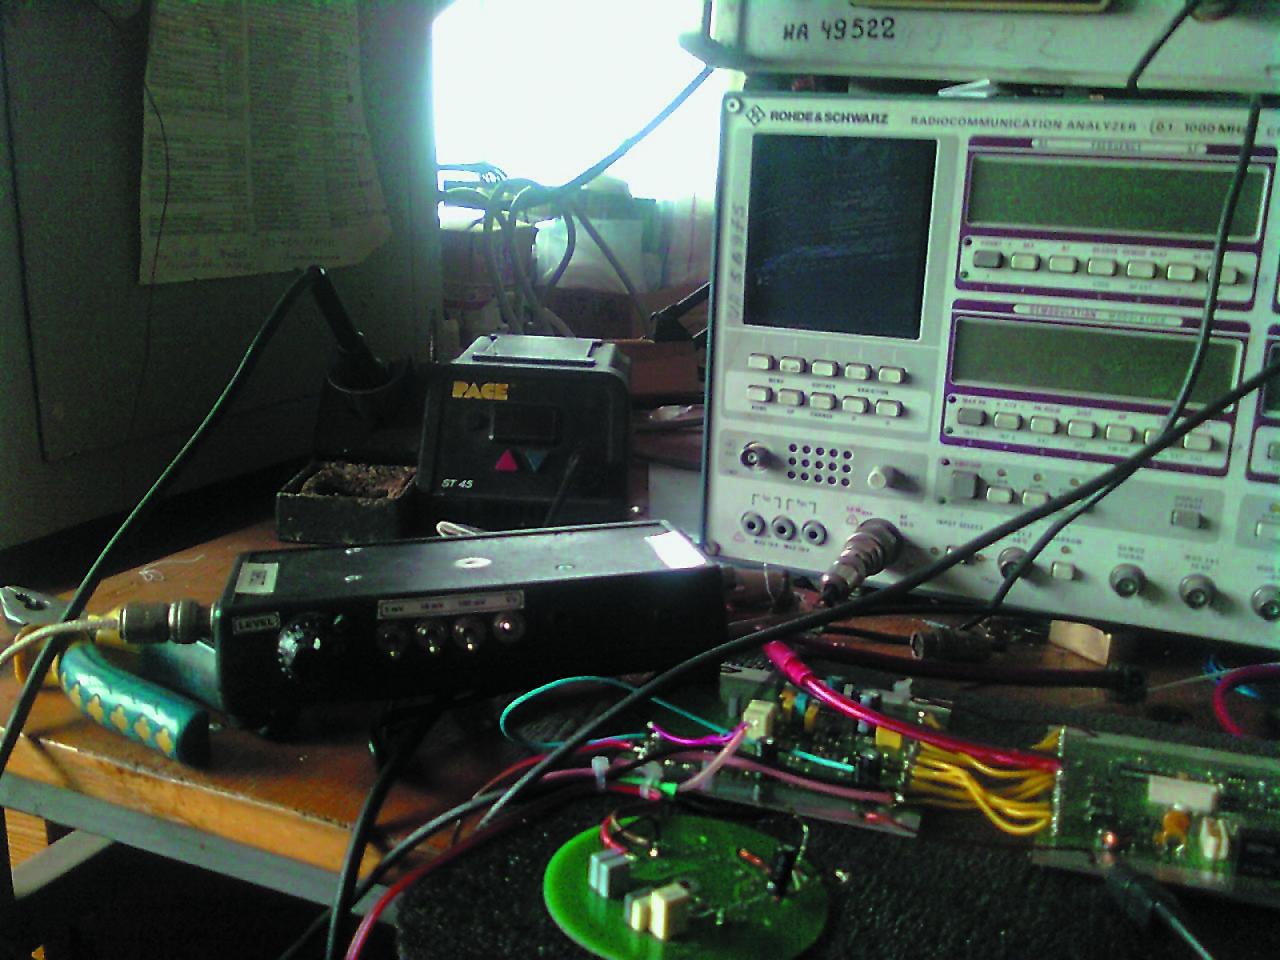 Внешний вид генератора шума